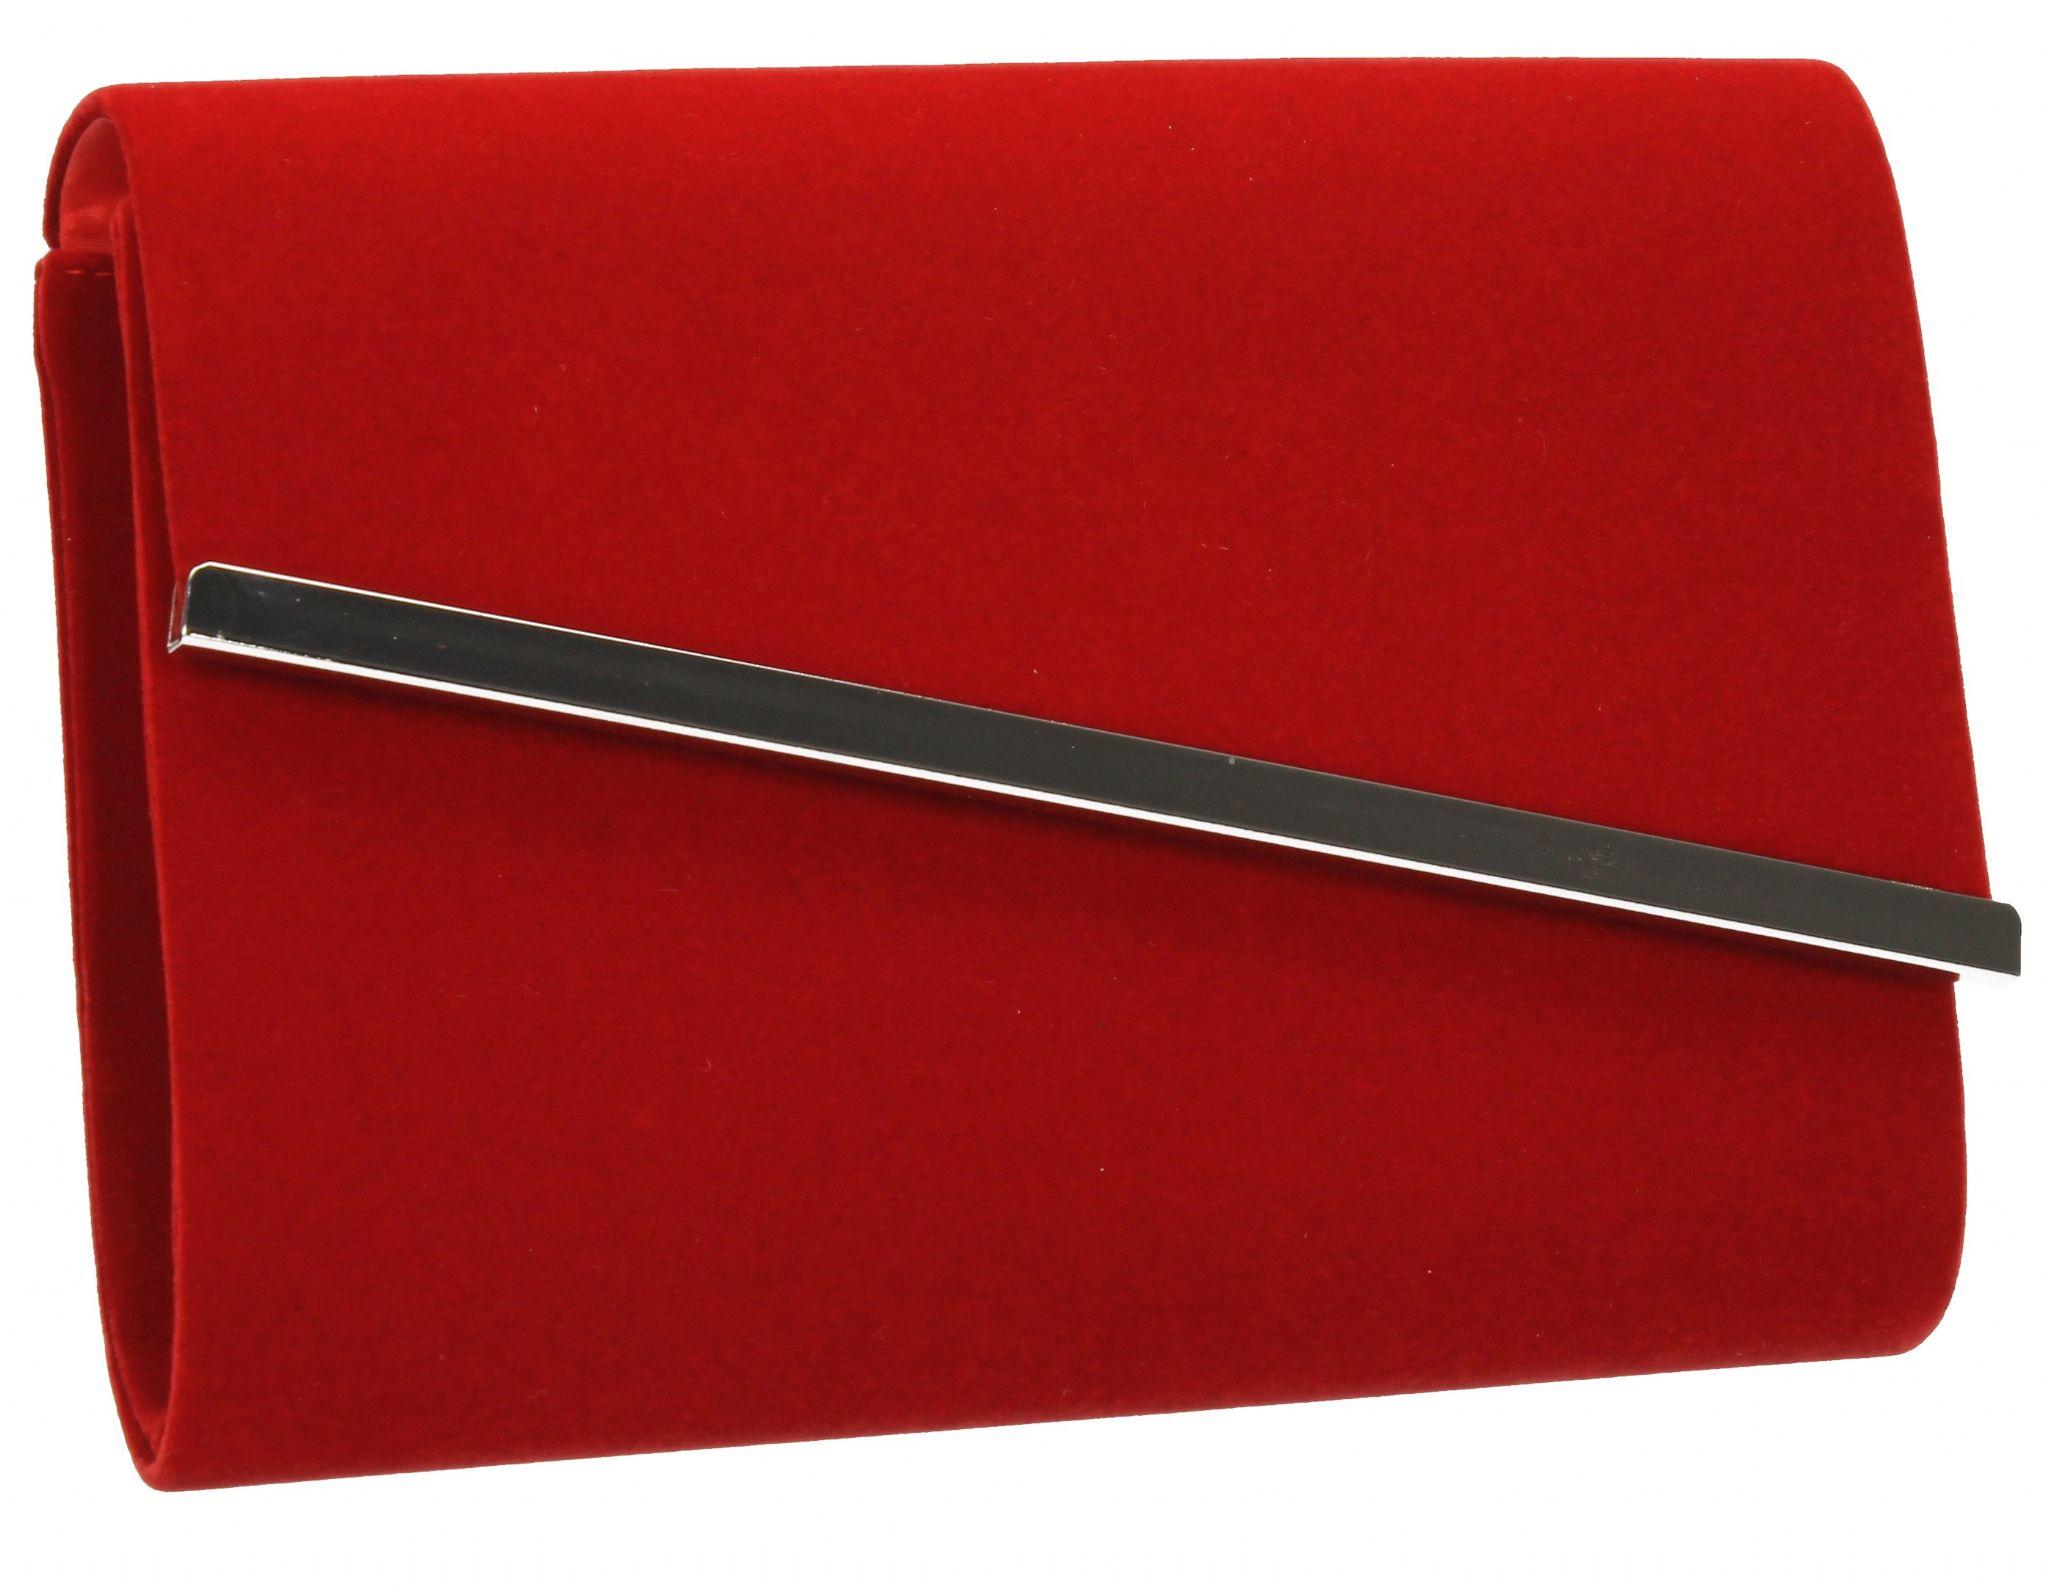 red clutch bag long lasting czdqpqf